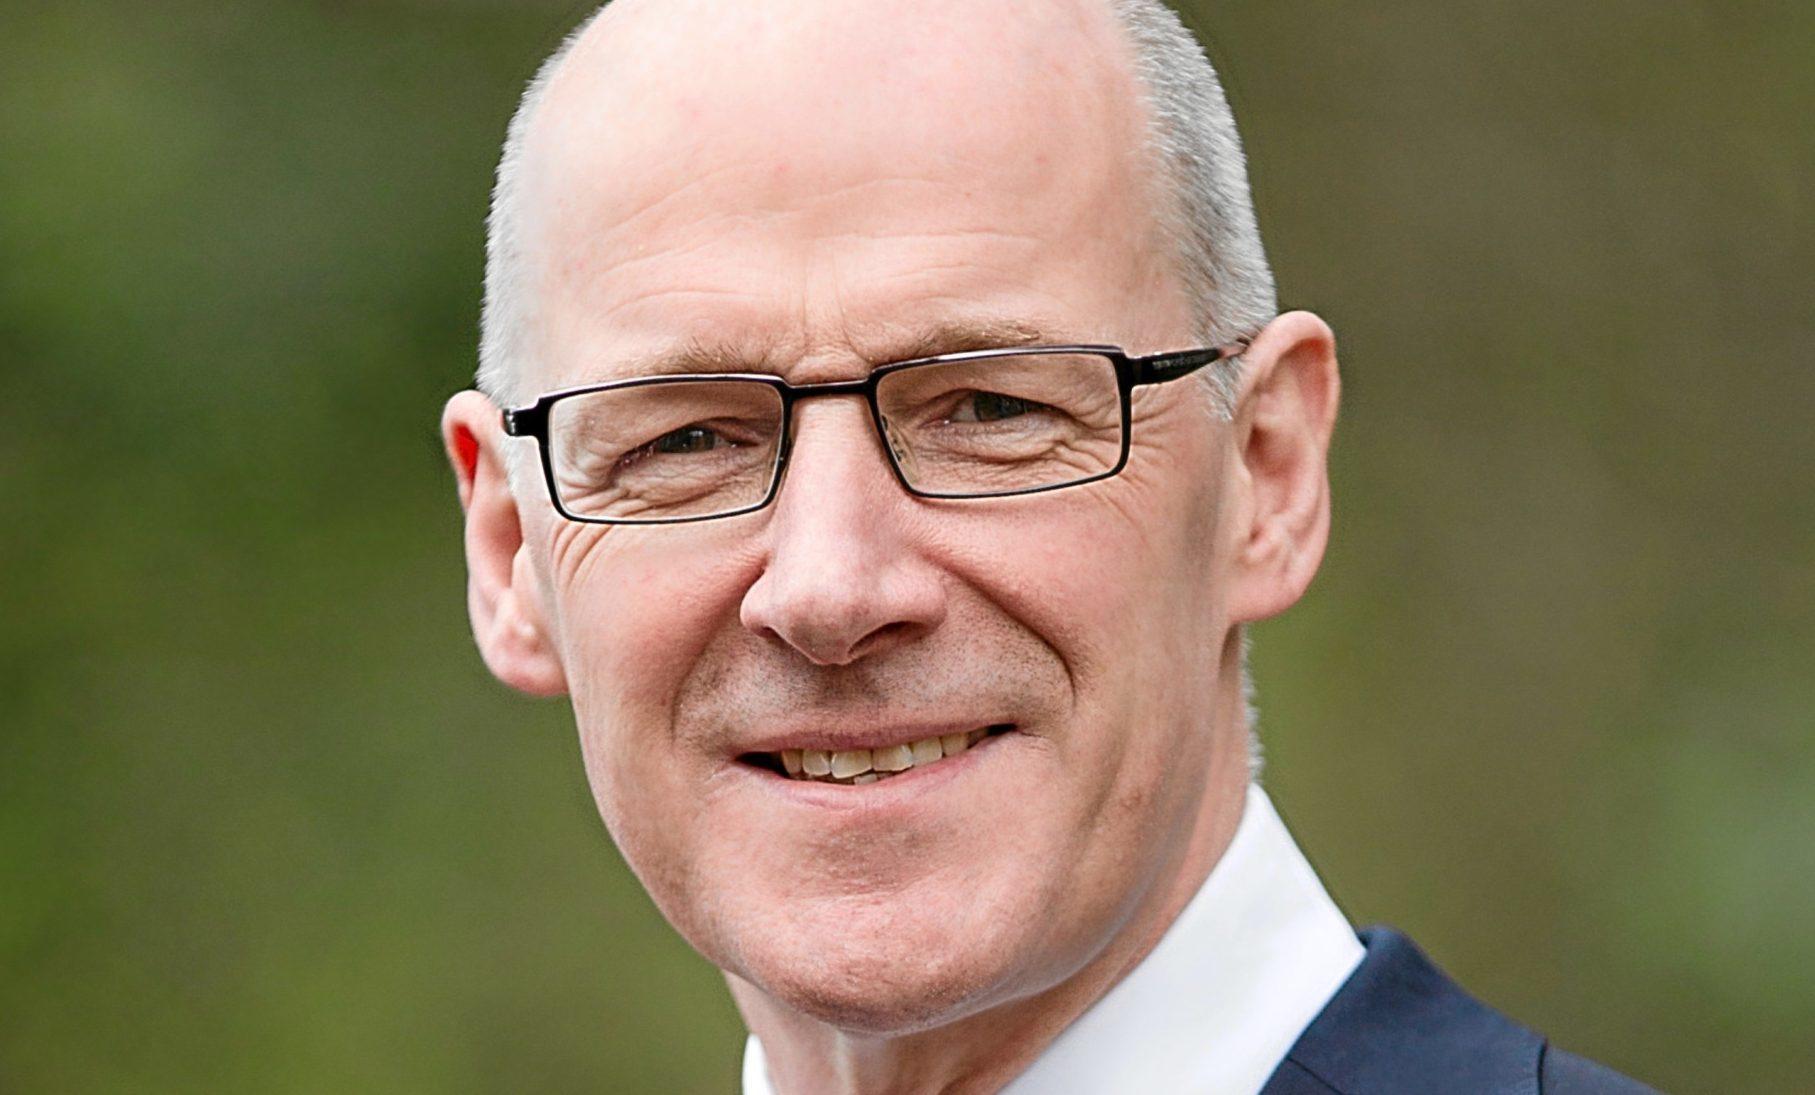 John Swinney MSP helped Perth Autism Support secure emergency funding